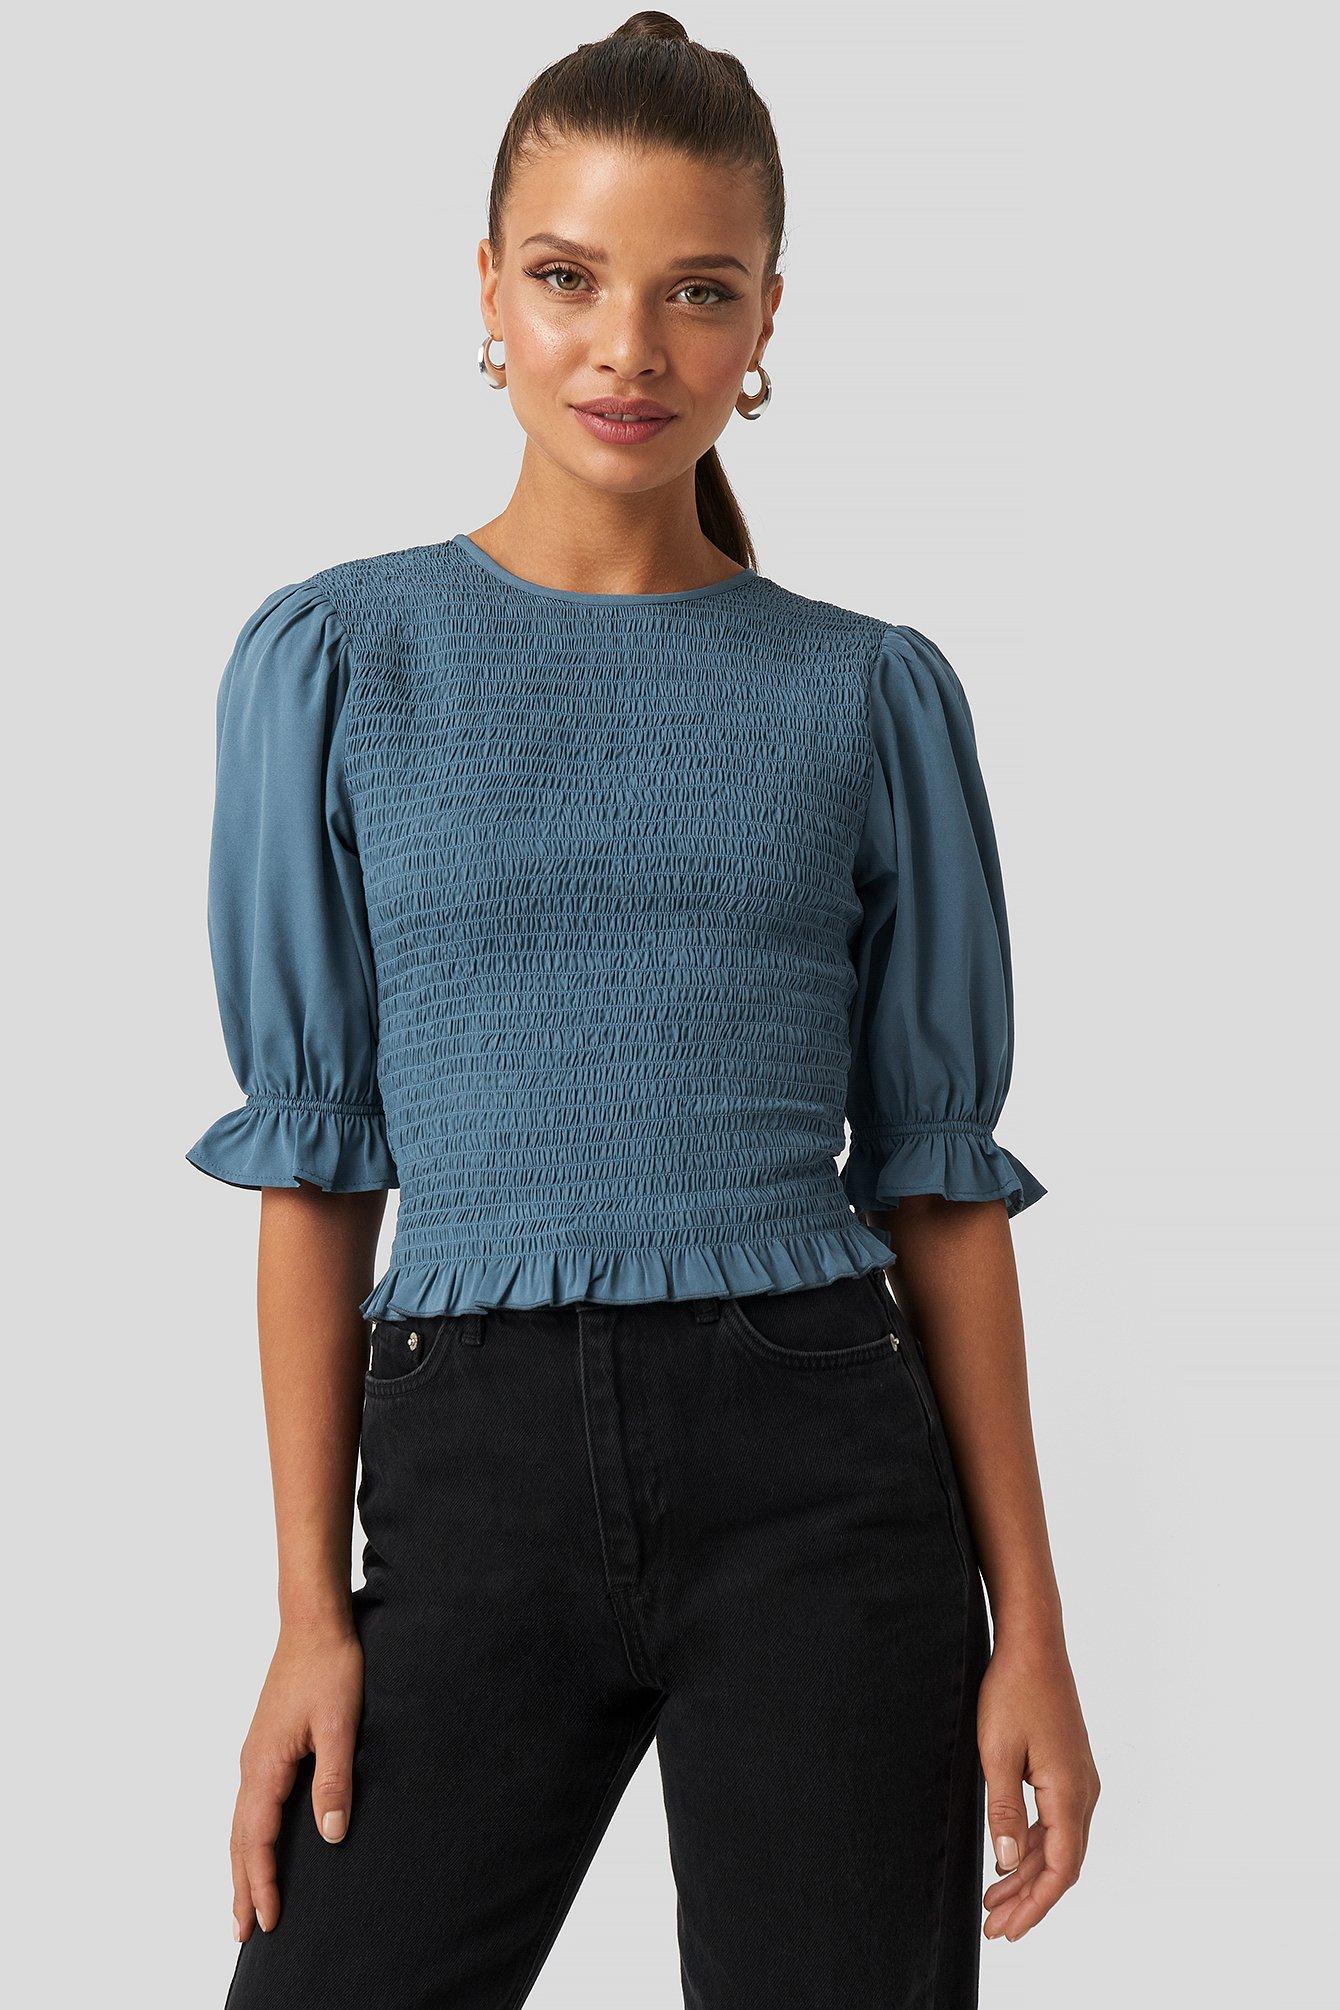 Smocked Short Sleeve Blouse Bleu by Na Kd Boho